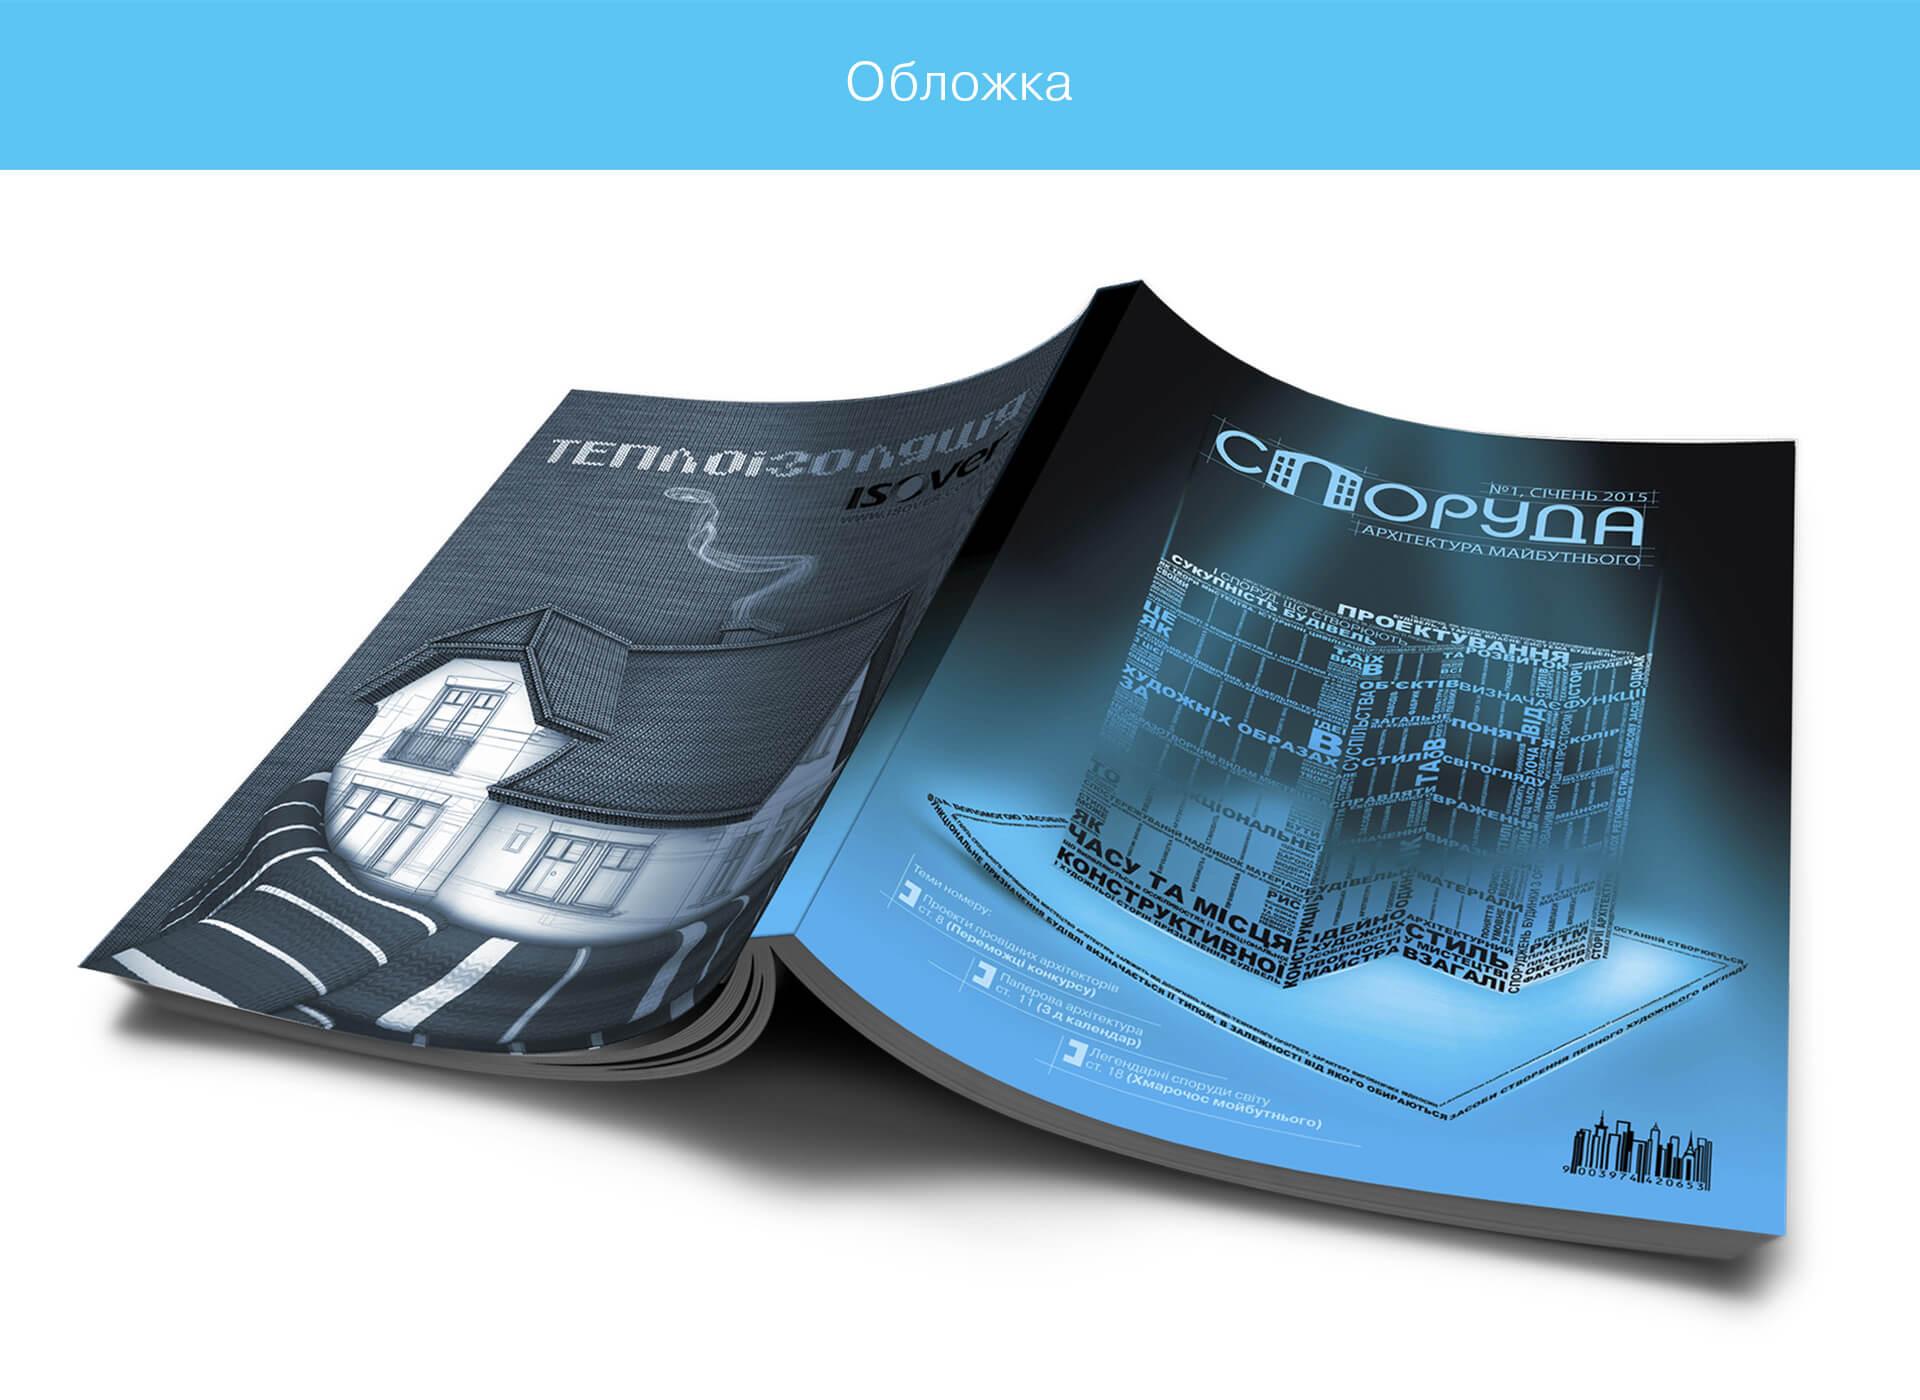 prokochuk_irina_architectural-magazine-sporuda_2